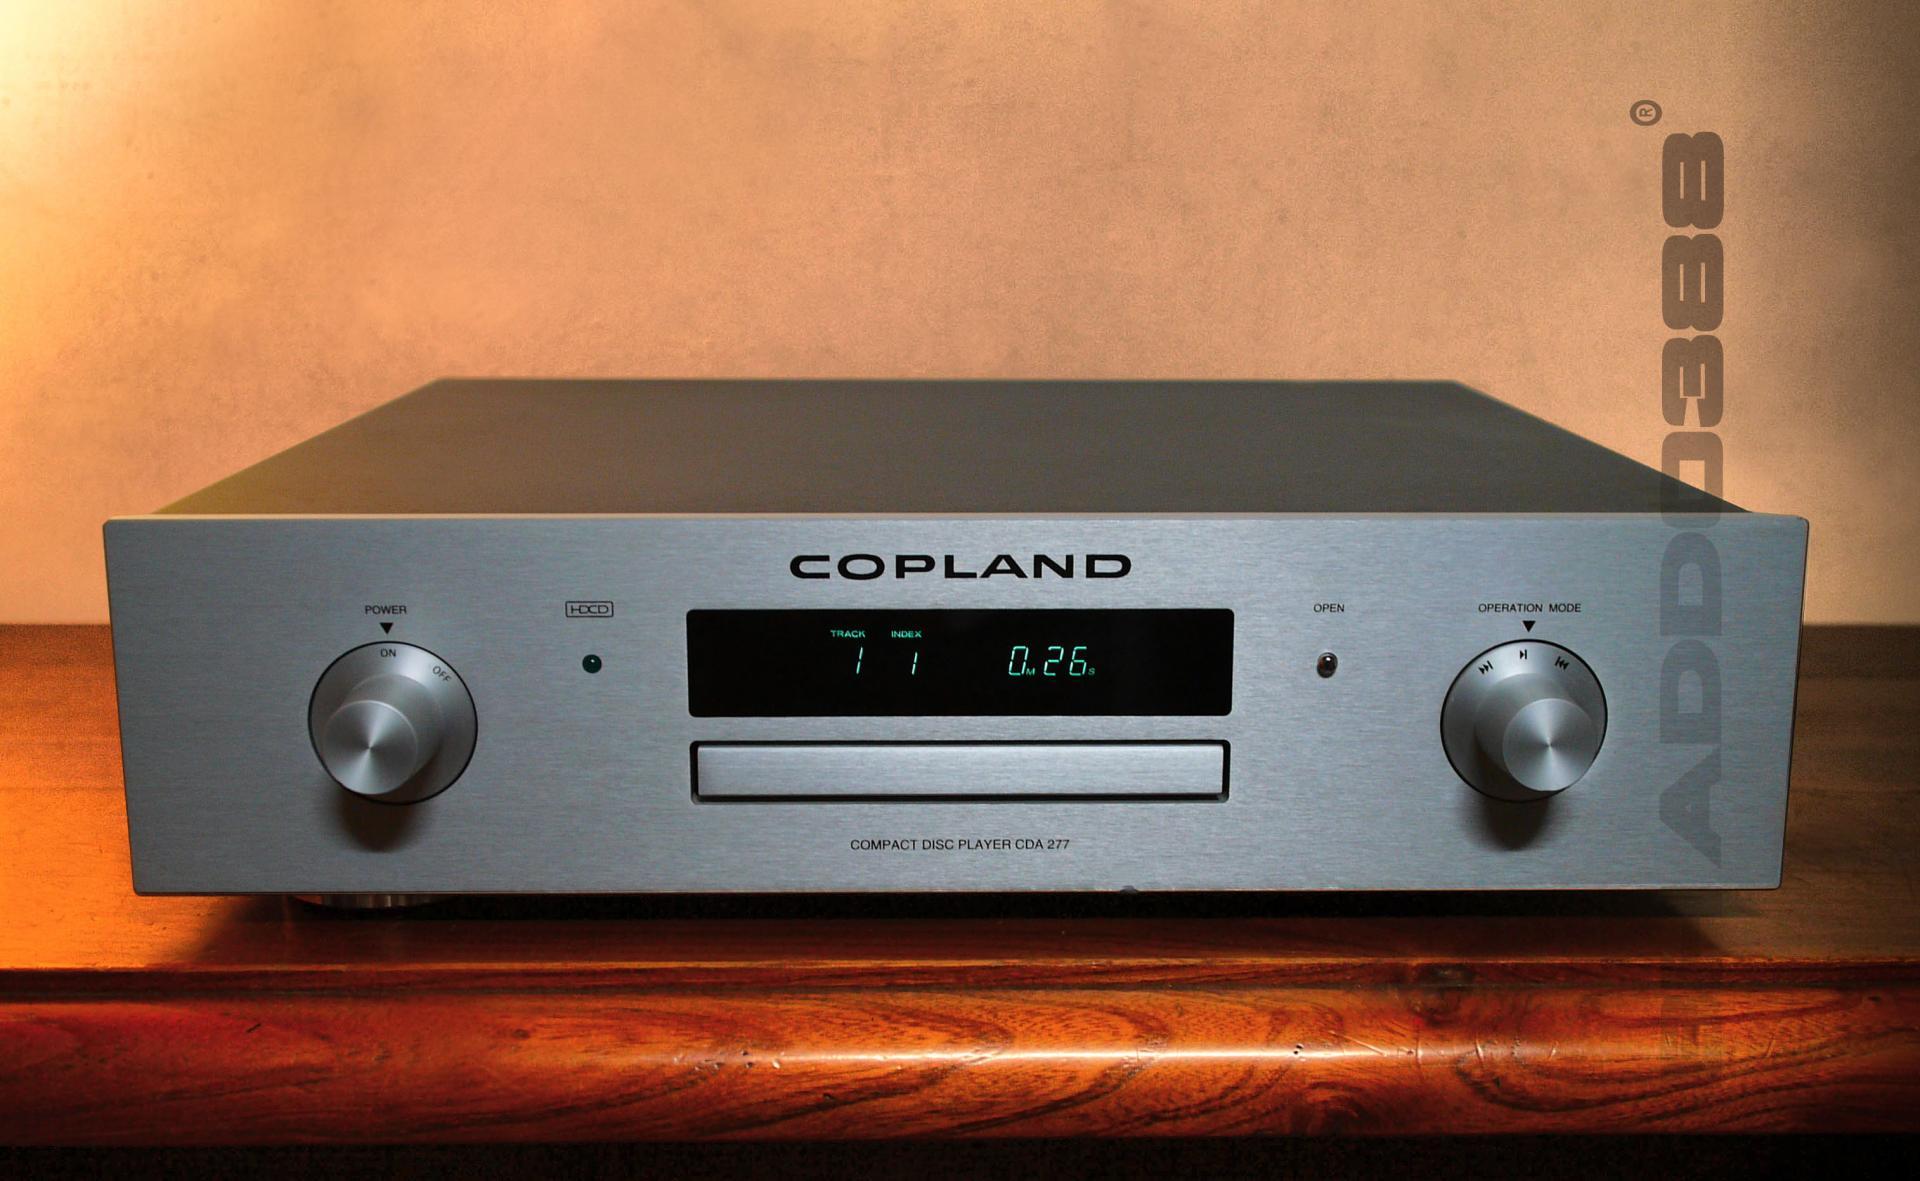 Copland cda 277 01